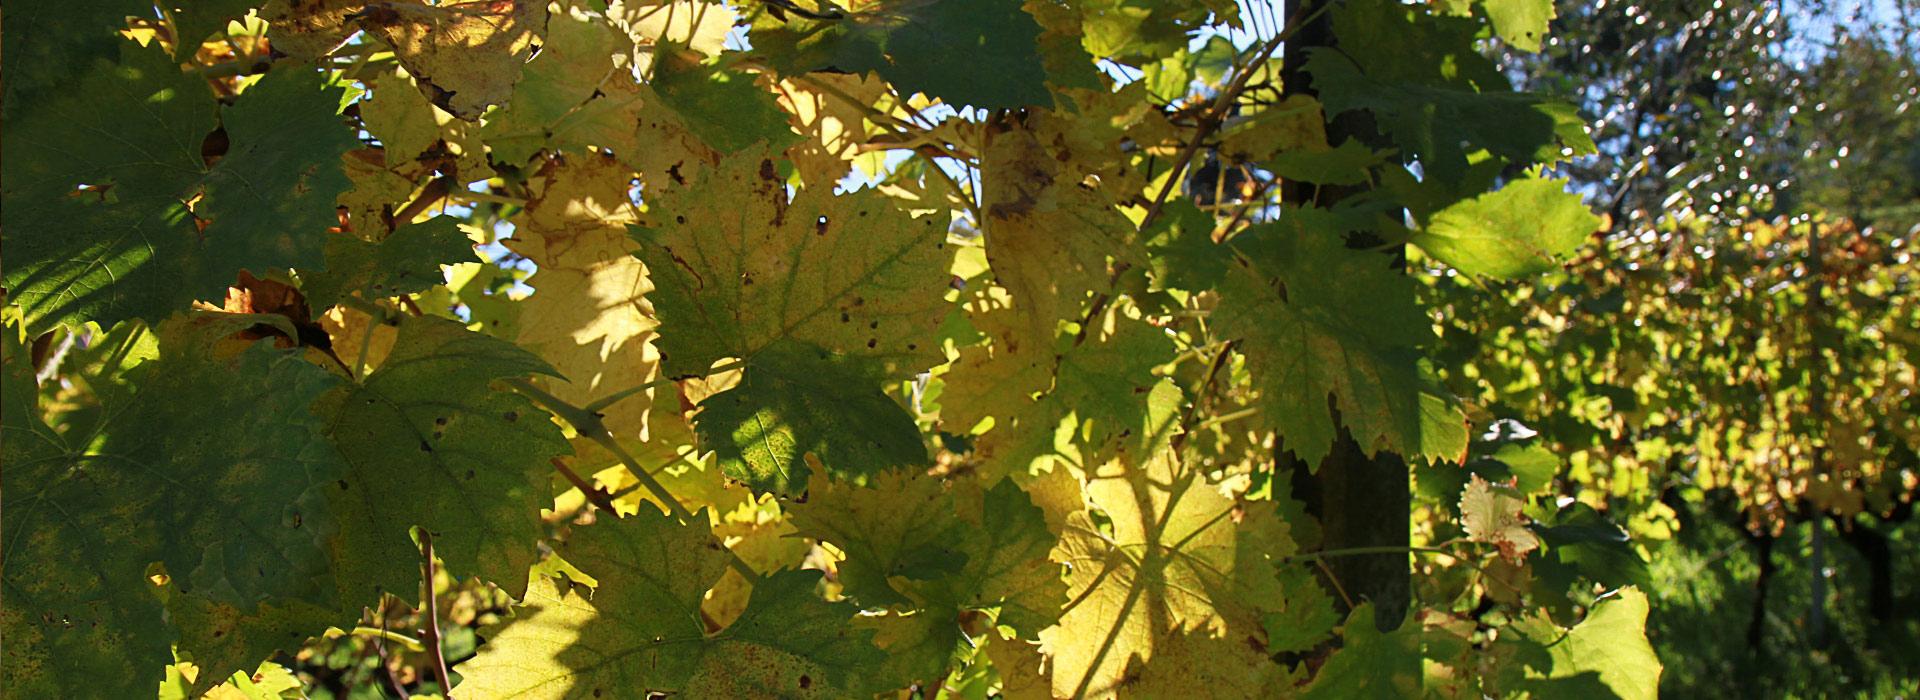 Lamporecchio: Olio, vino e sapori antichi